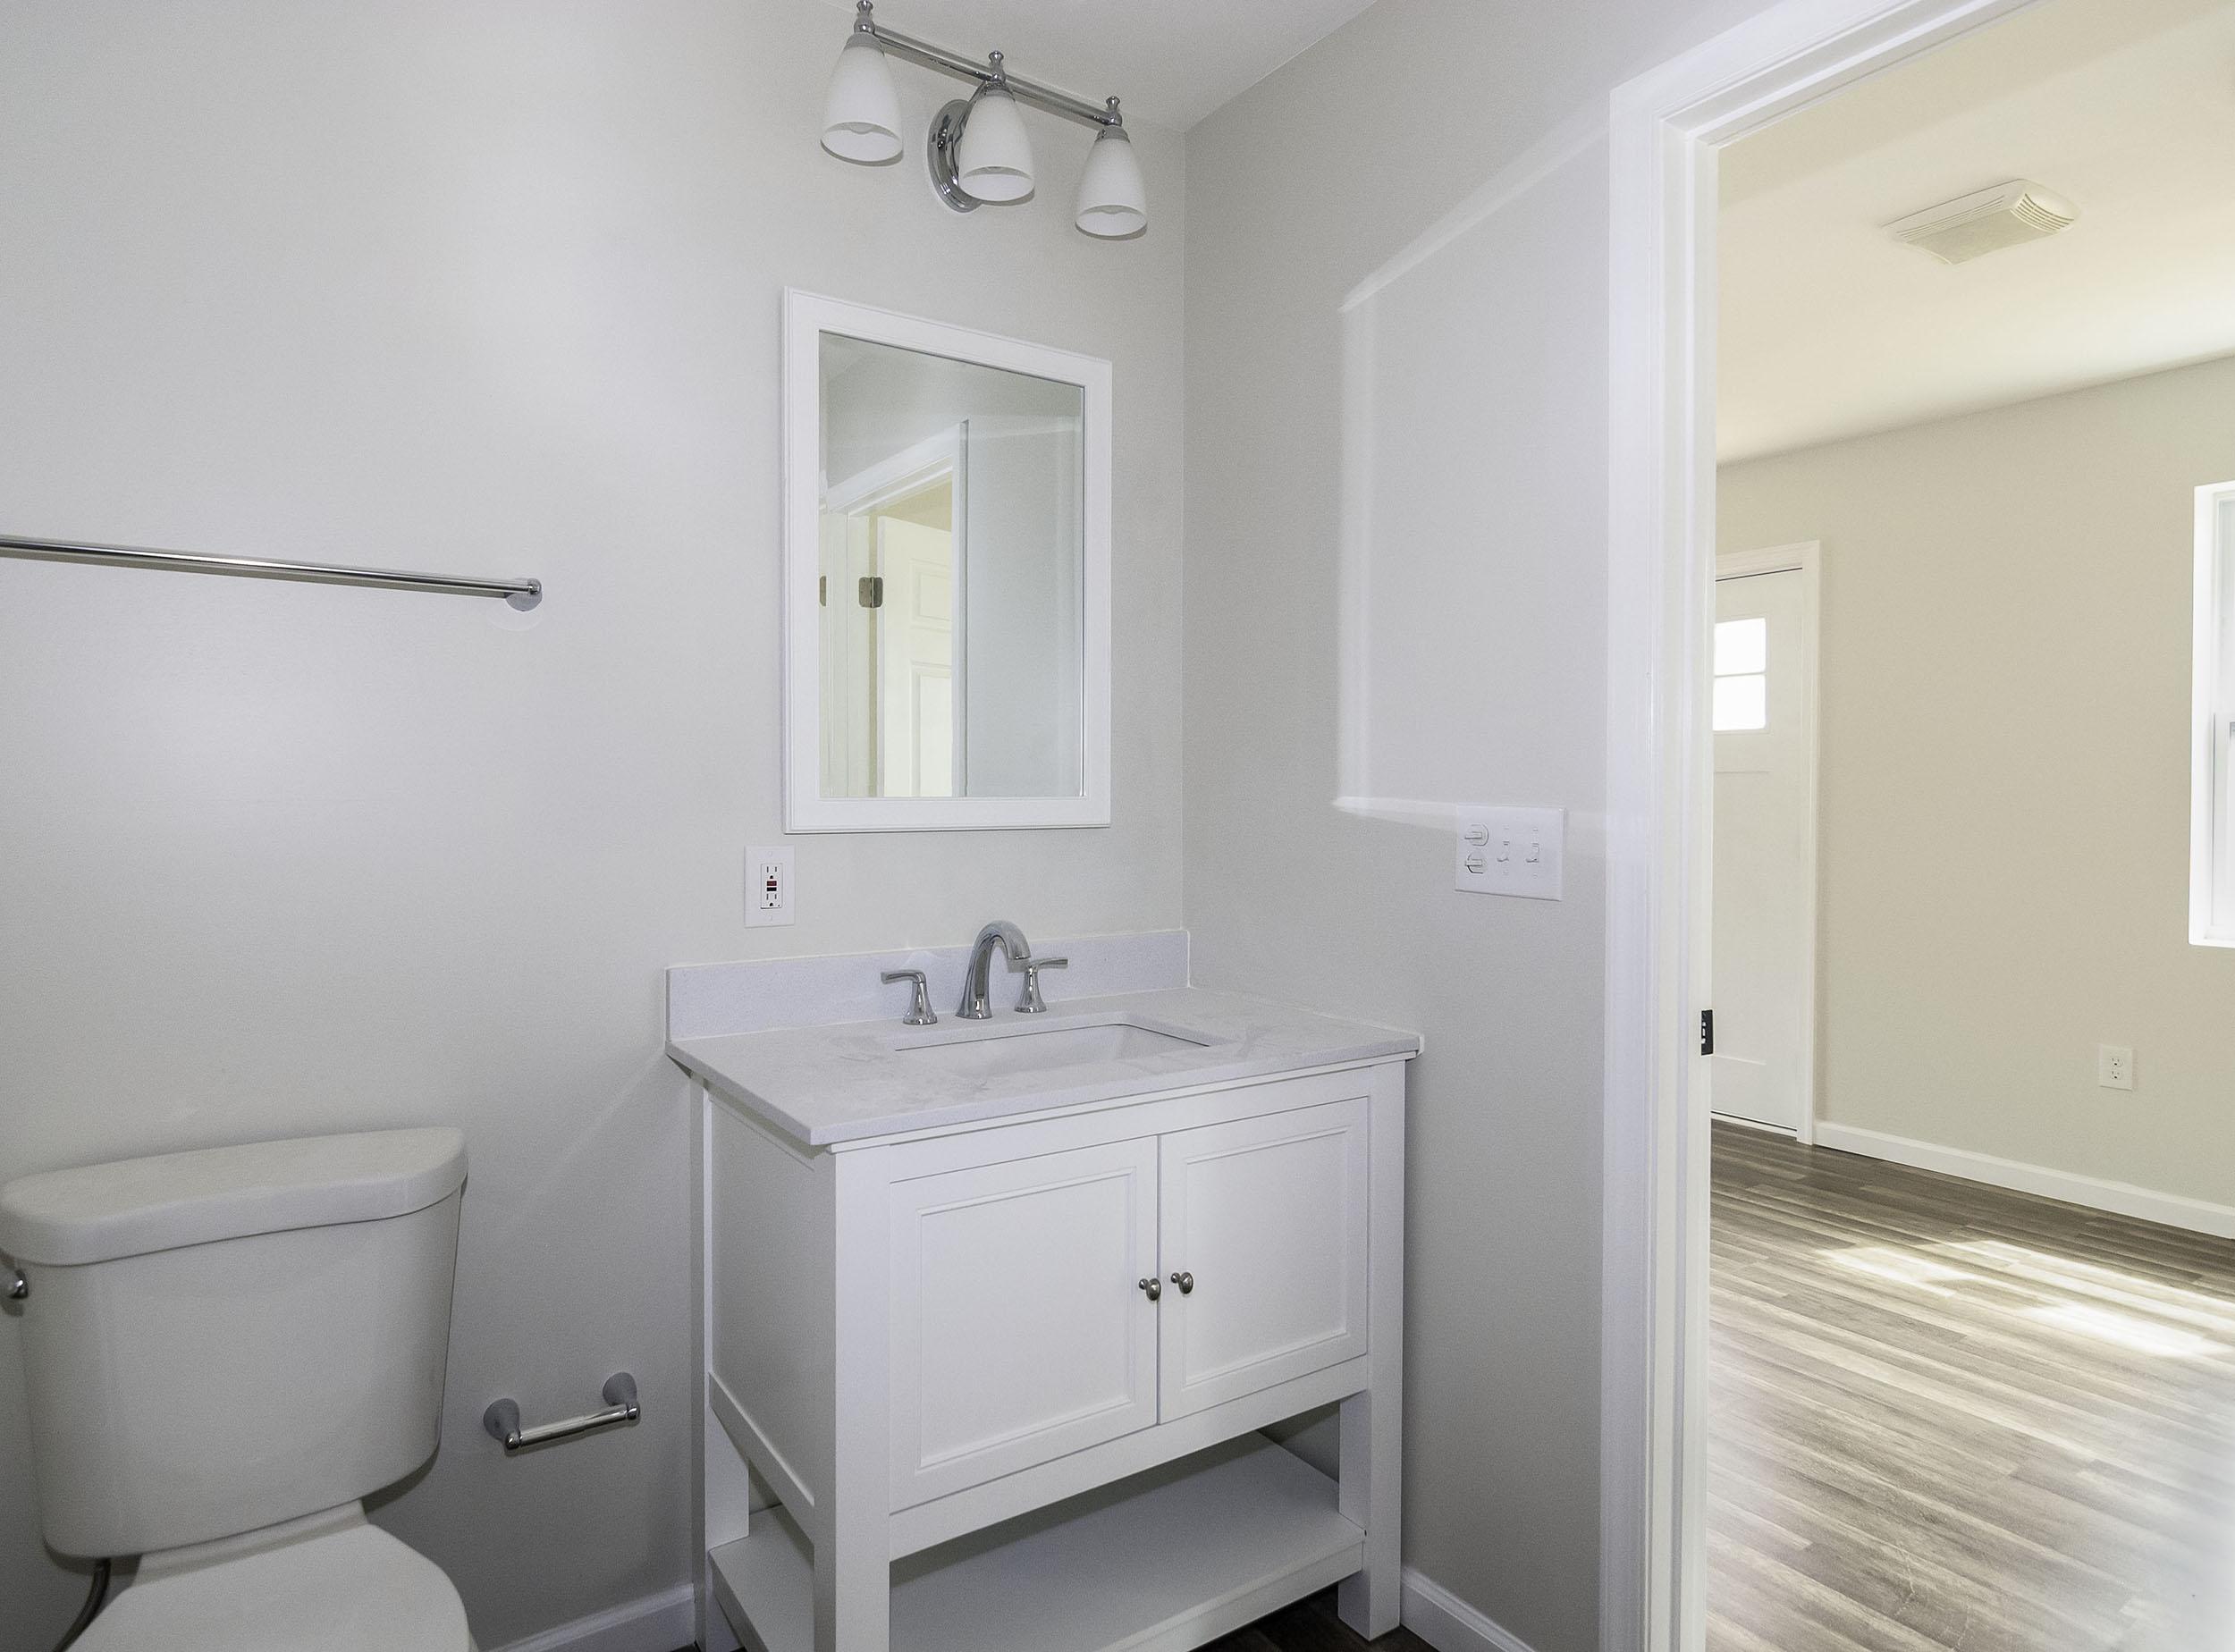 Londontown Bathroom 1 resize.jpg